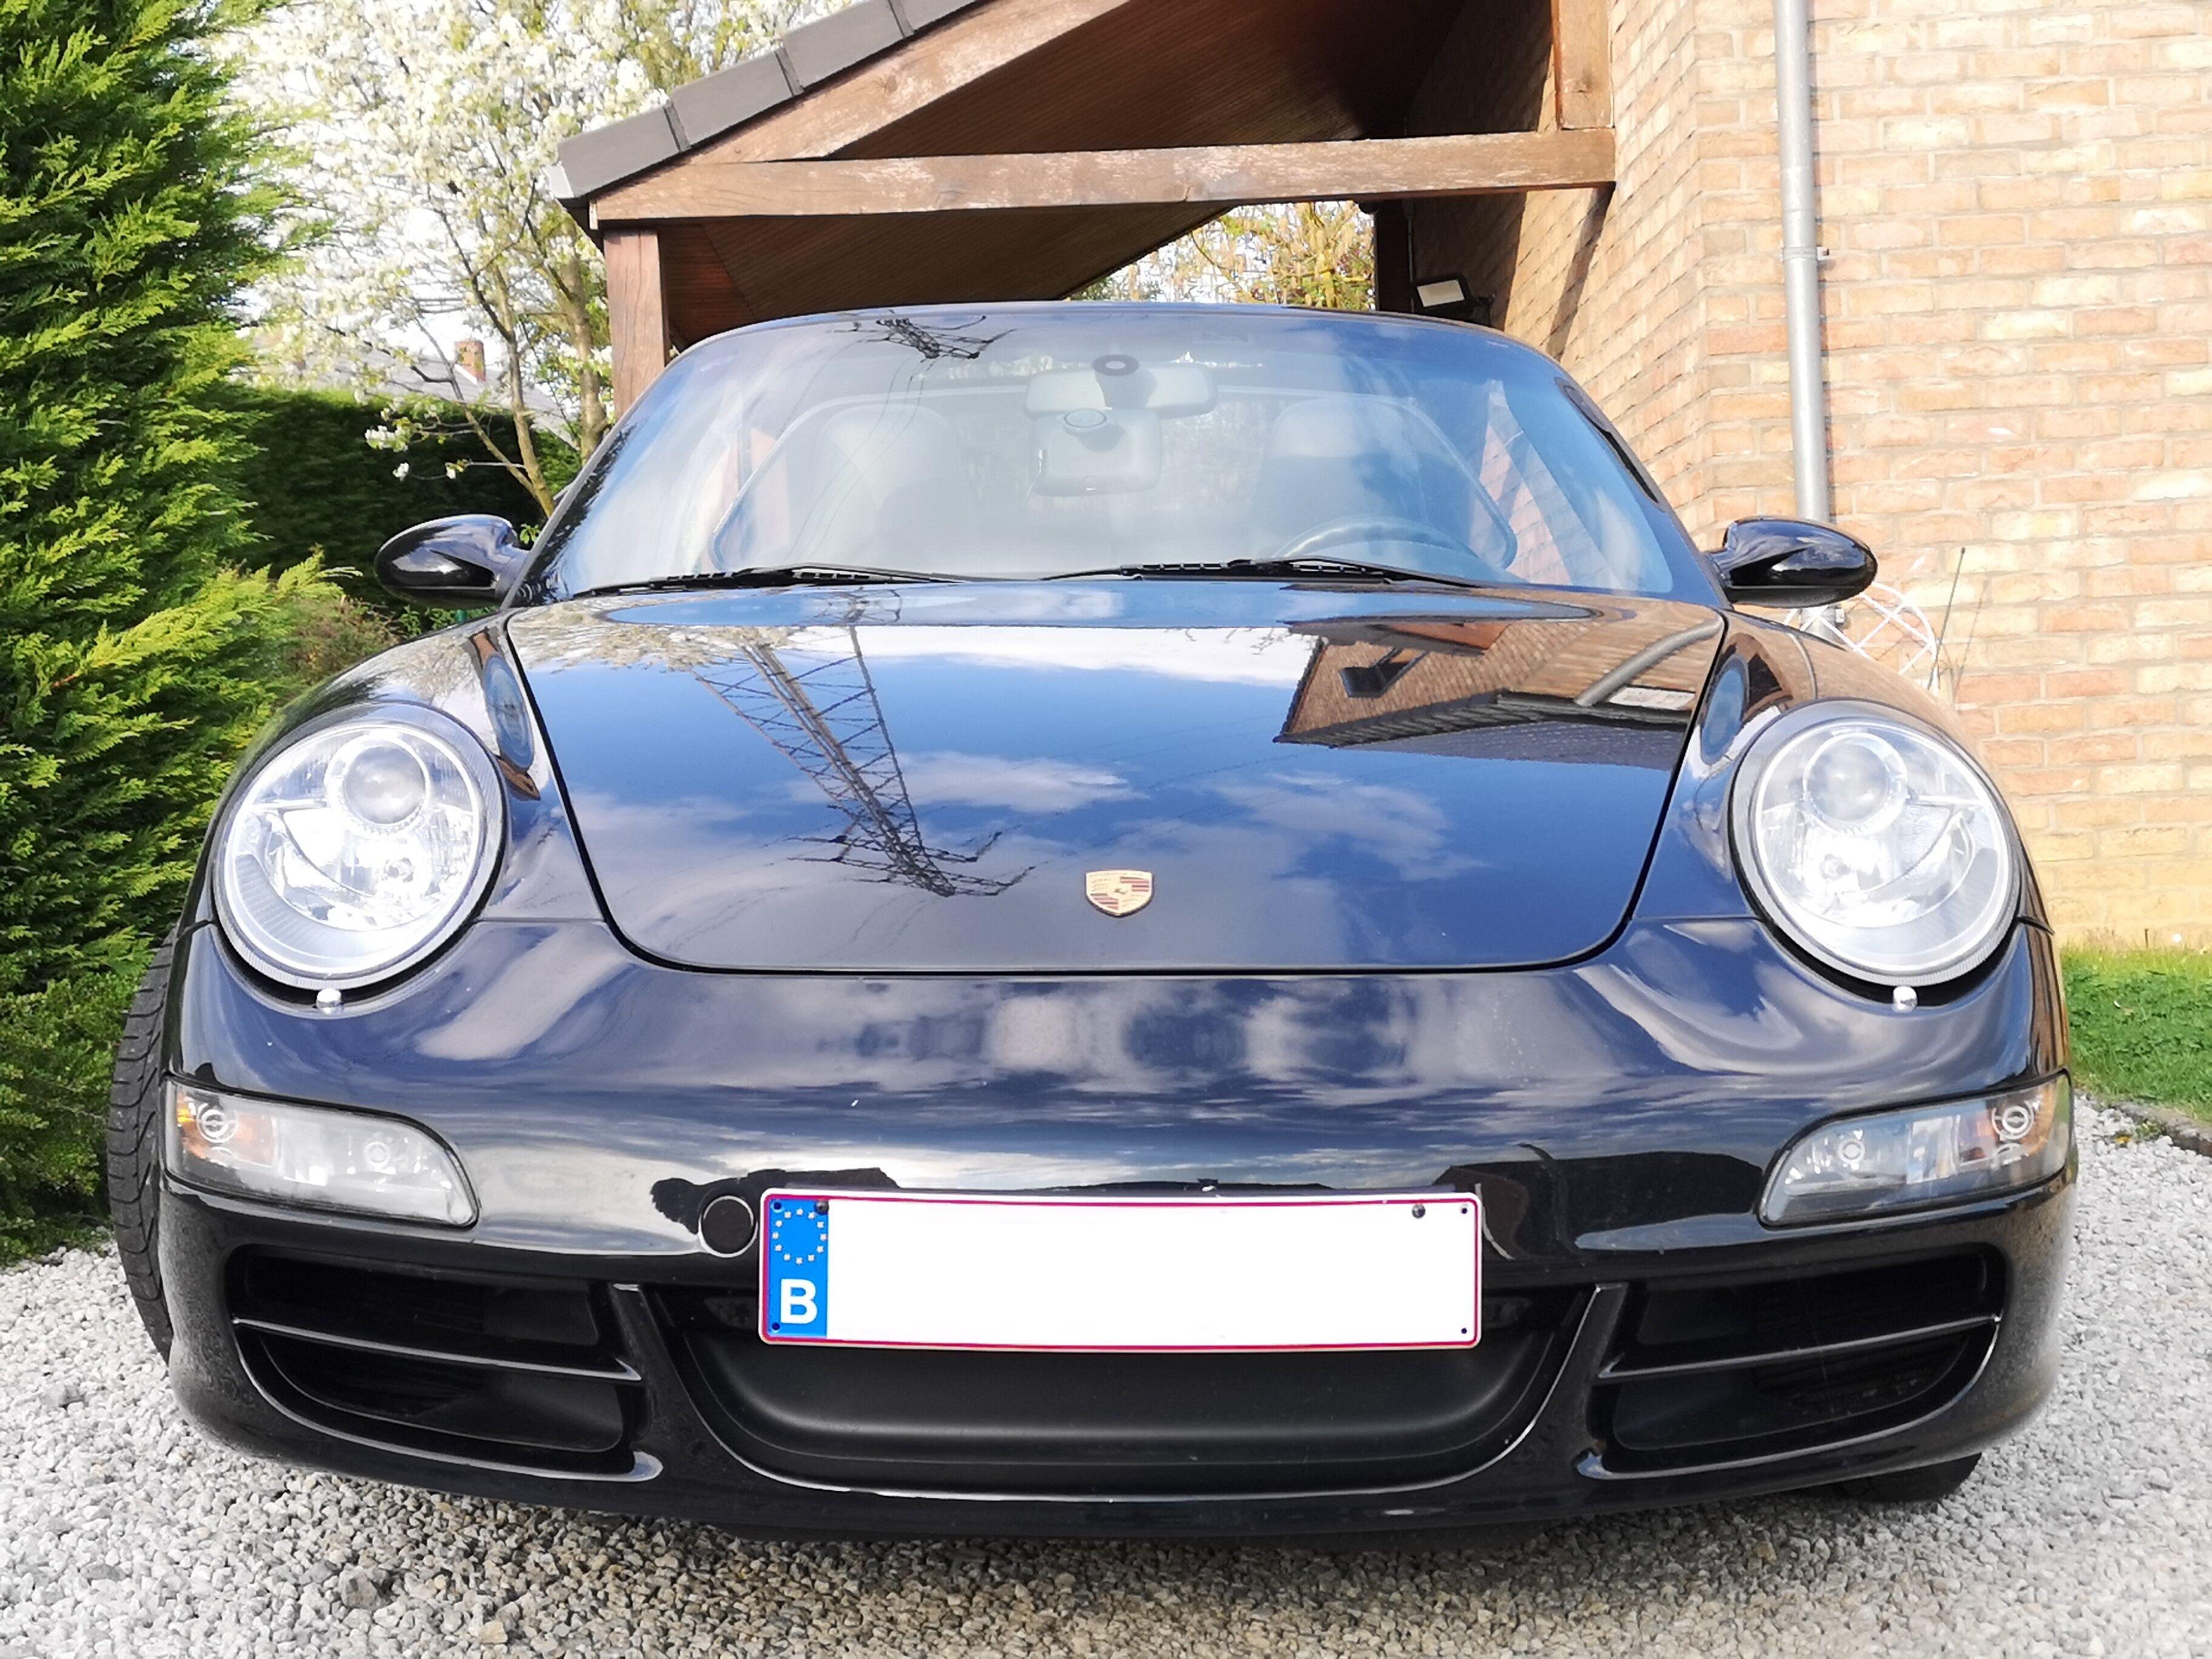 Porsche 911 CARRERA 2 CABRIOLET - 2008 5/15